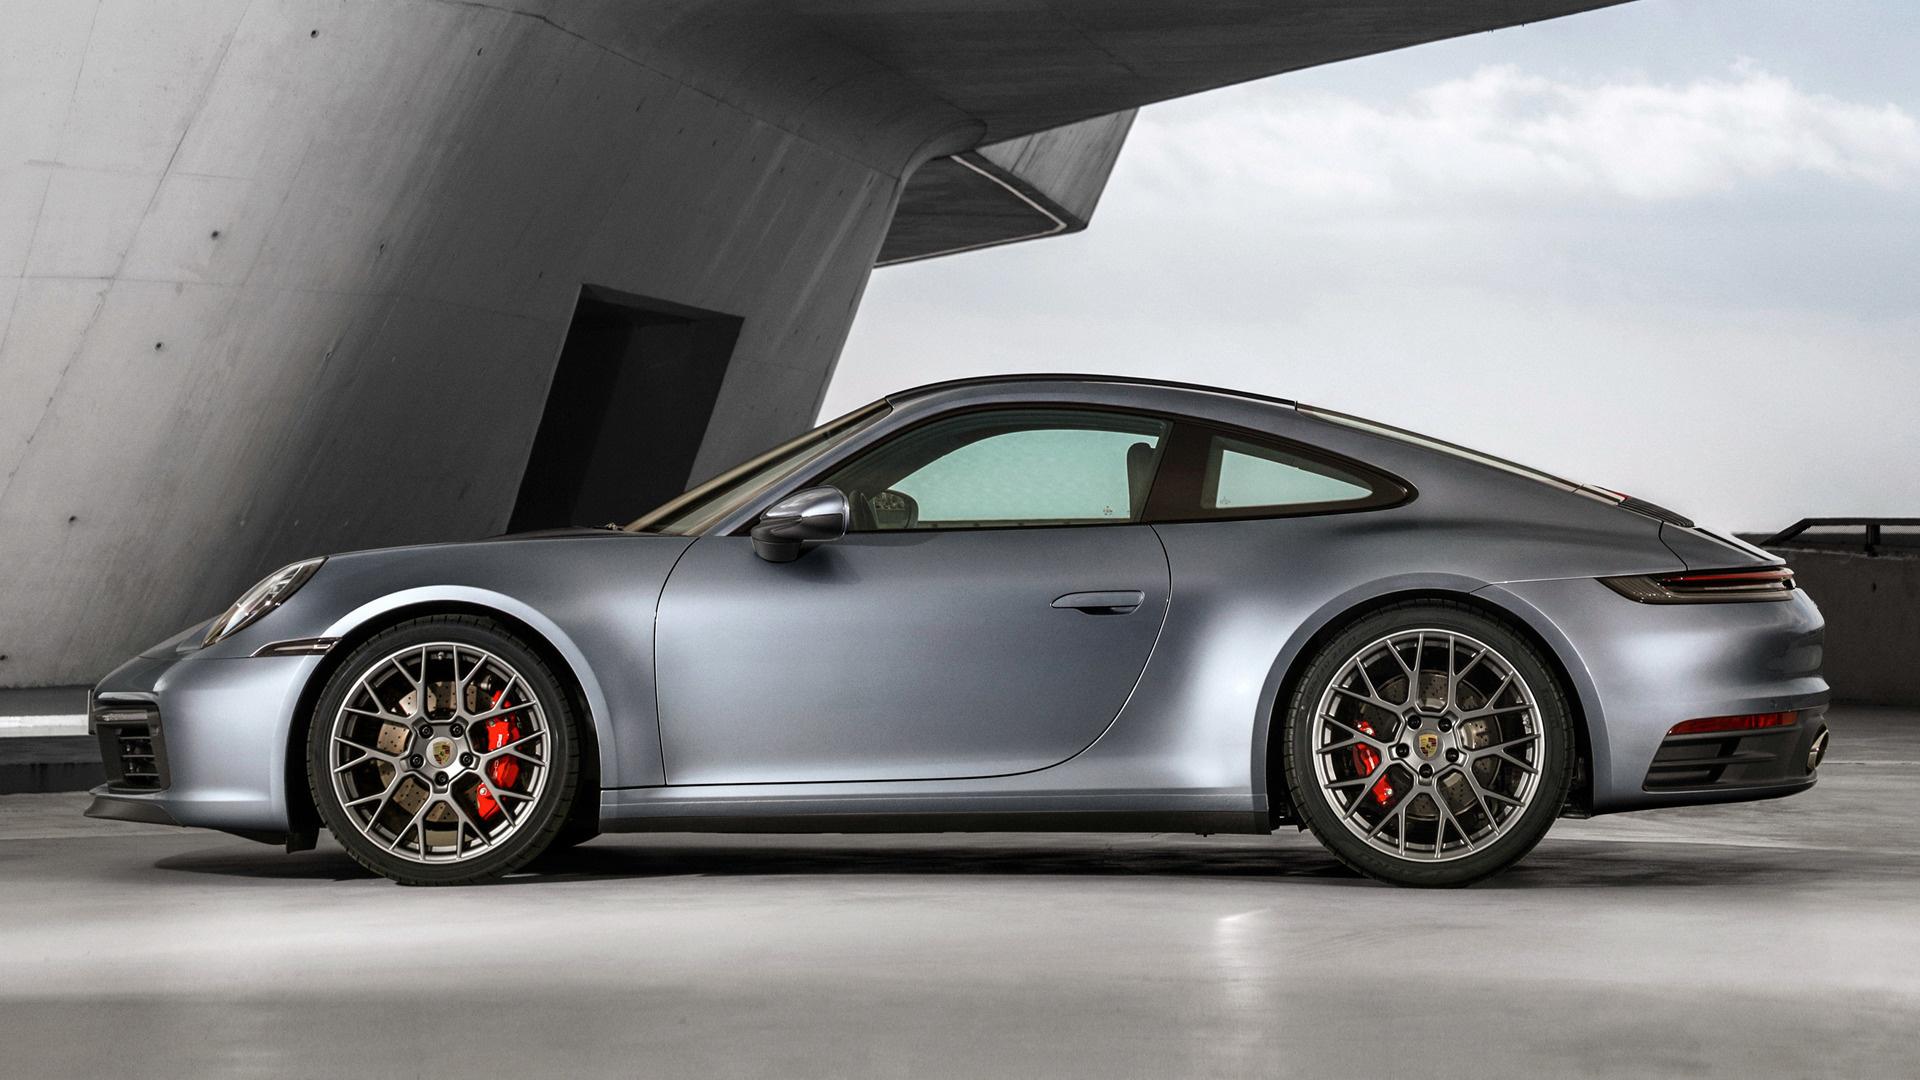 911 Carrera Gts >> 2019 Porsche 911 Carrera S - Wallpapers and HD Images ...